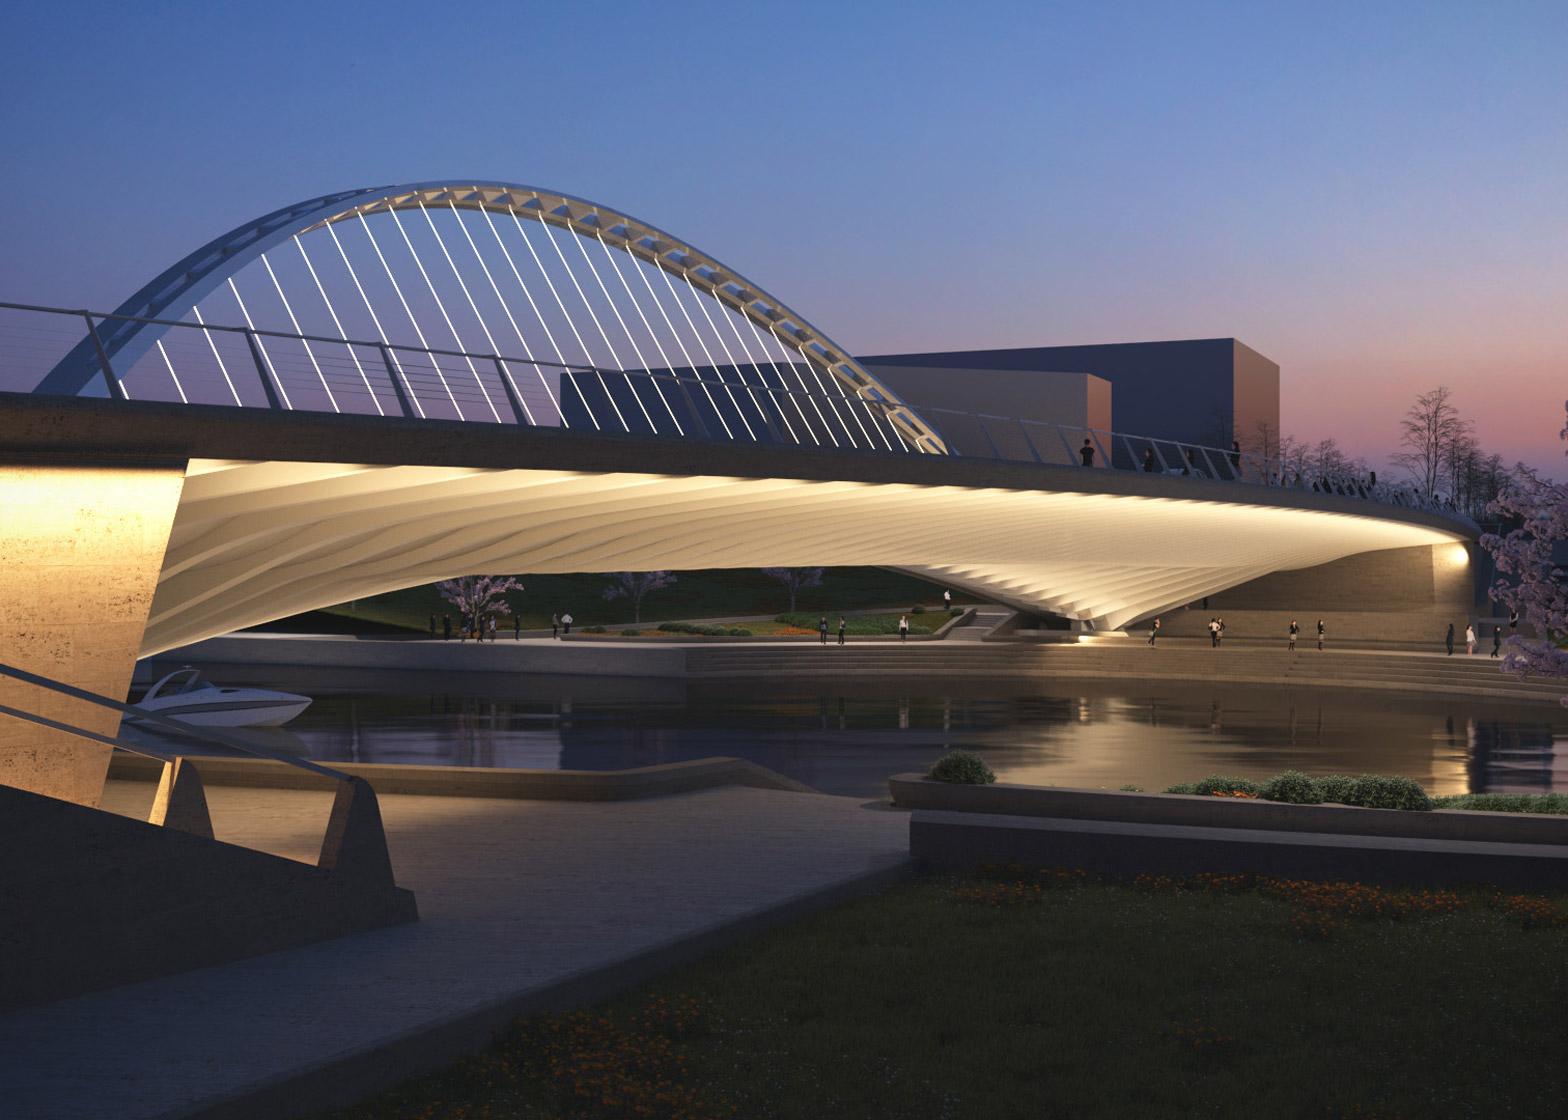 Calatrava Huashan bridges in China